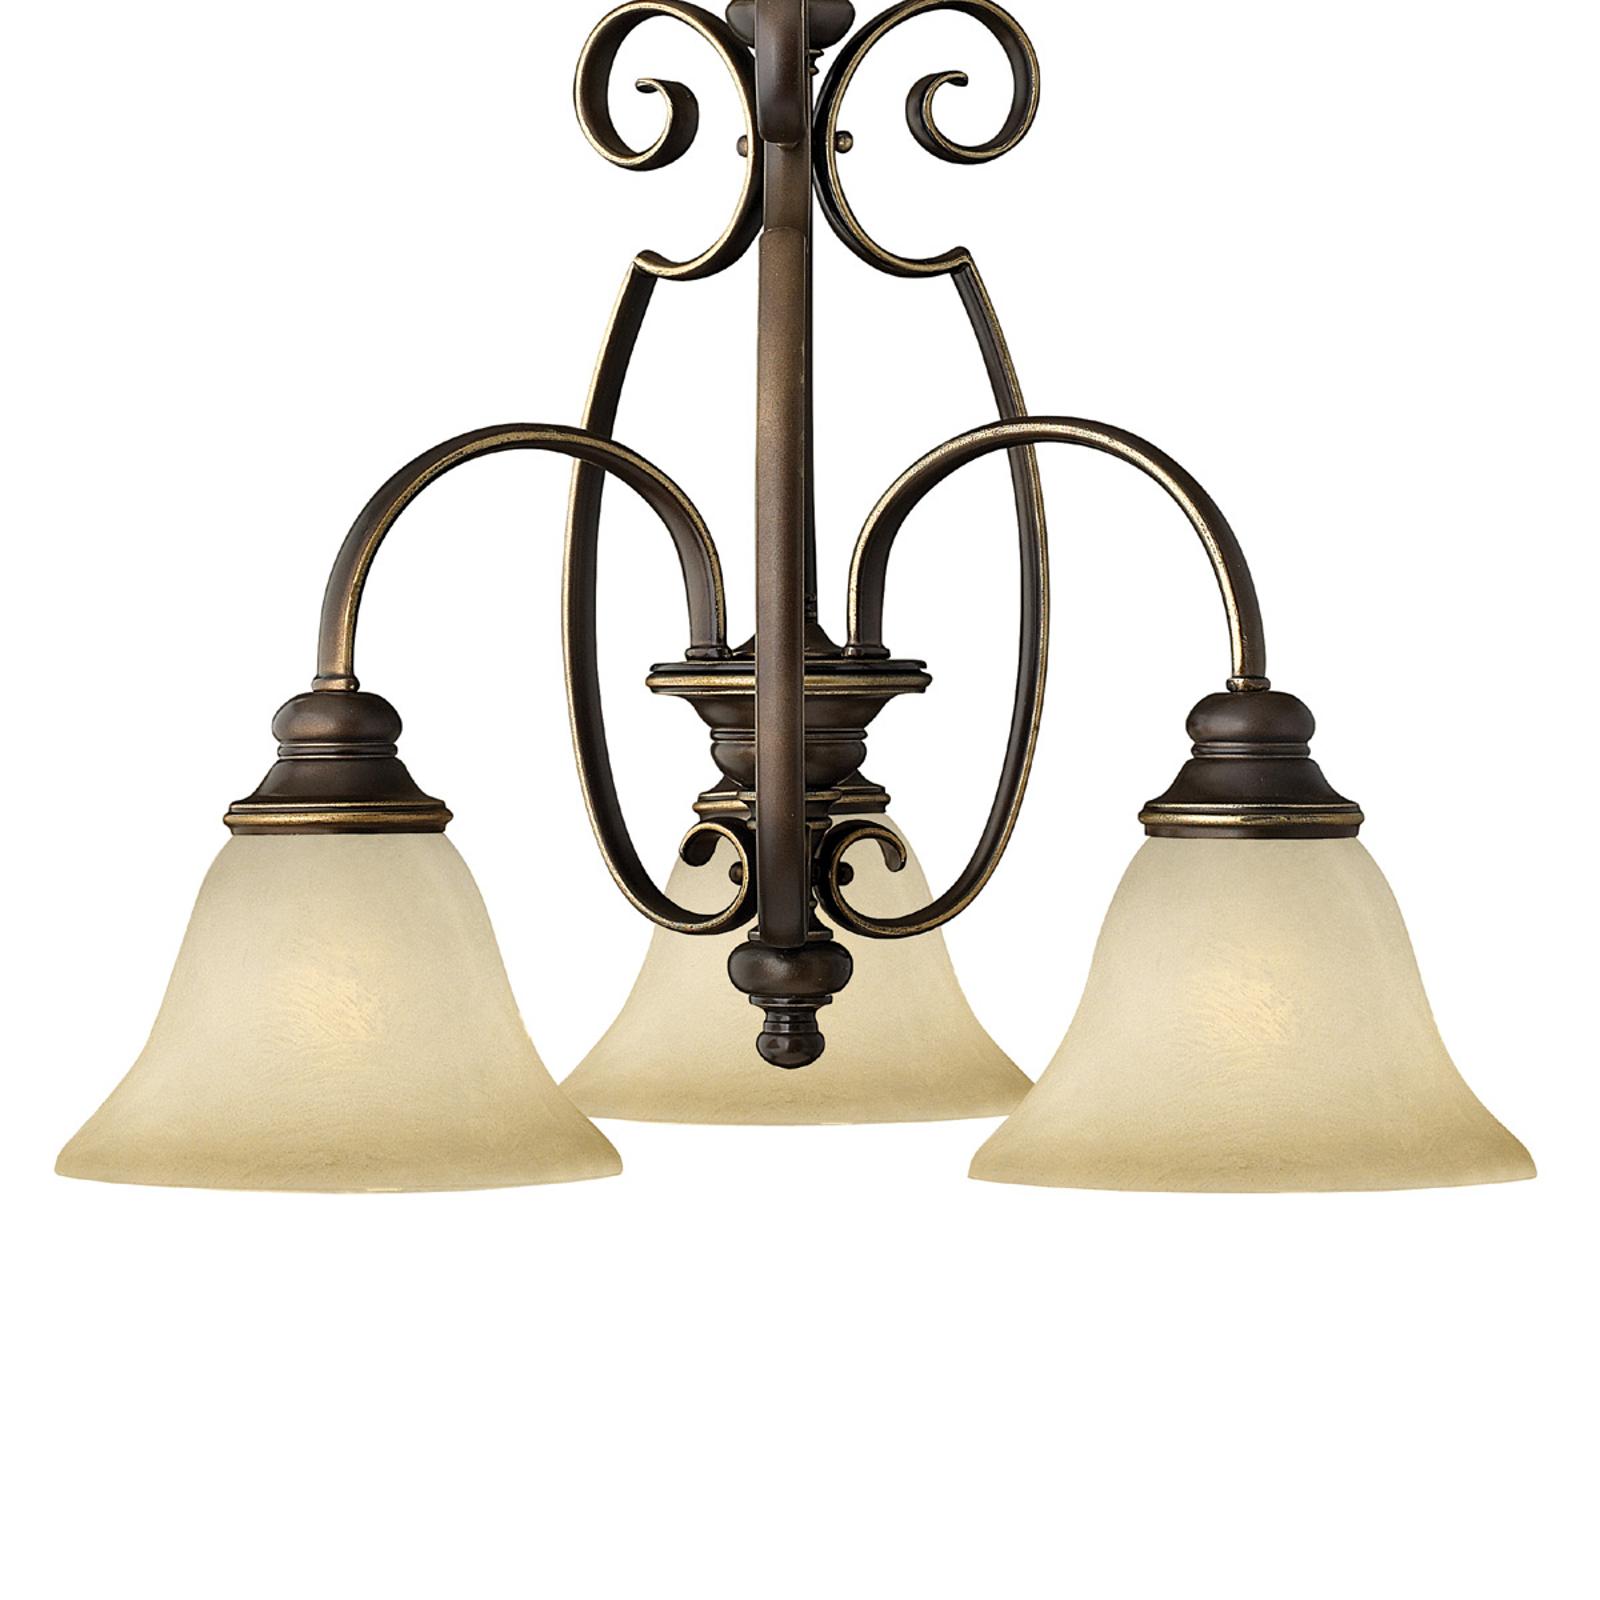 Cello Hanging Light Three Bulbs_3048119_1